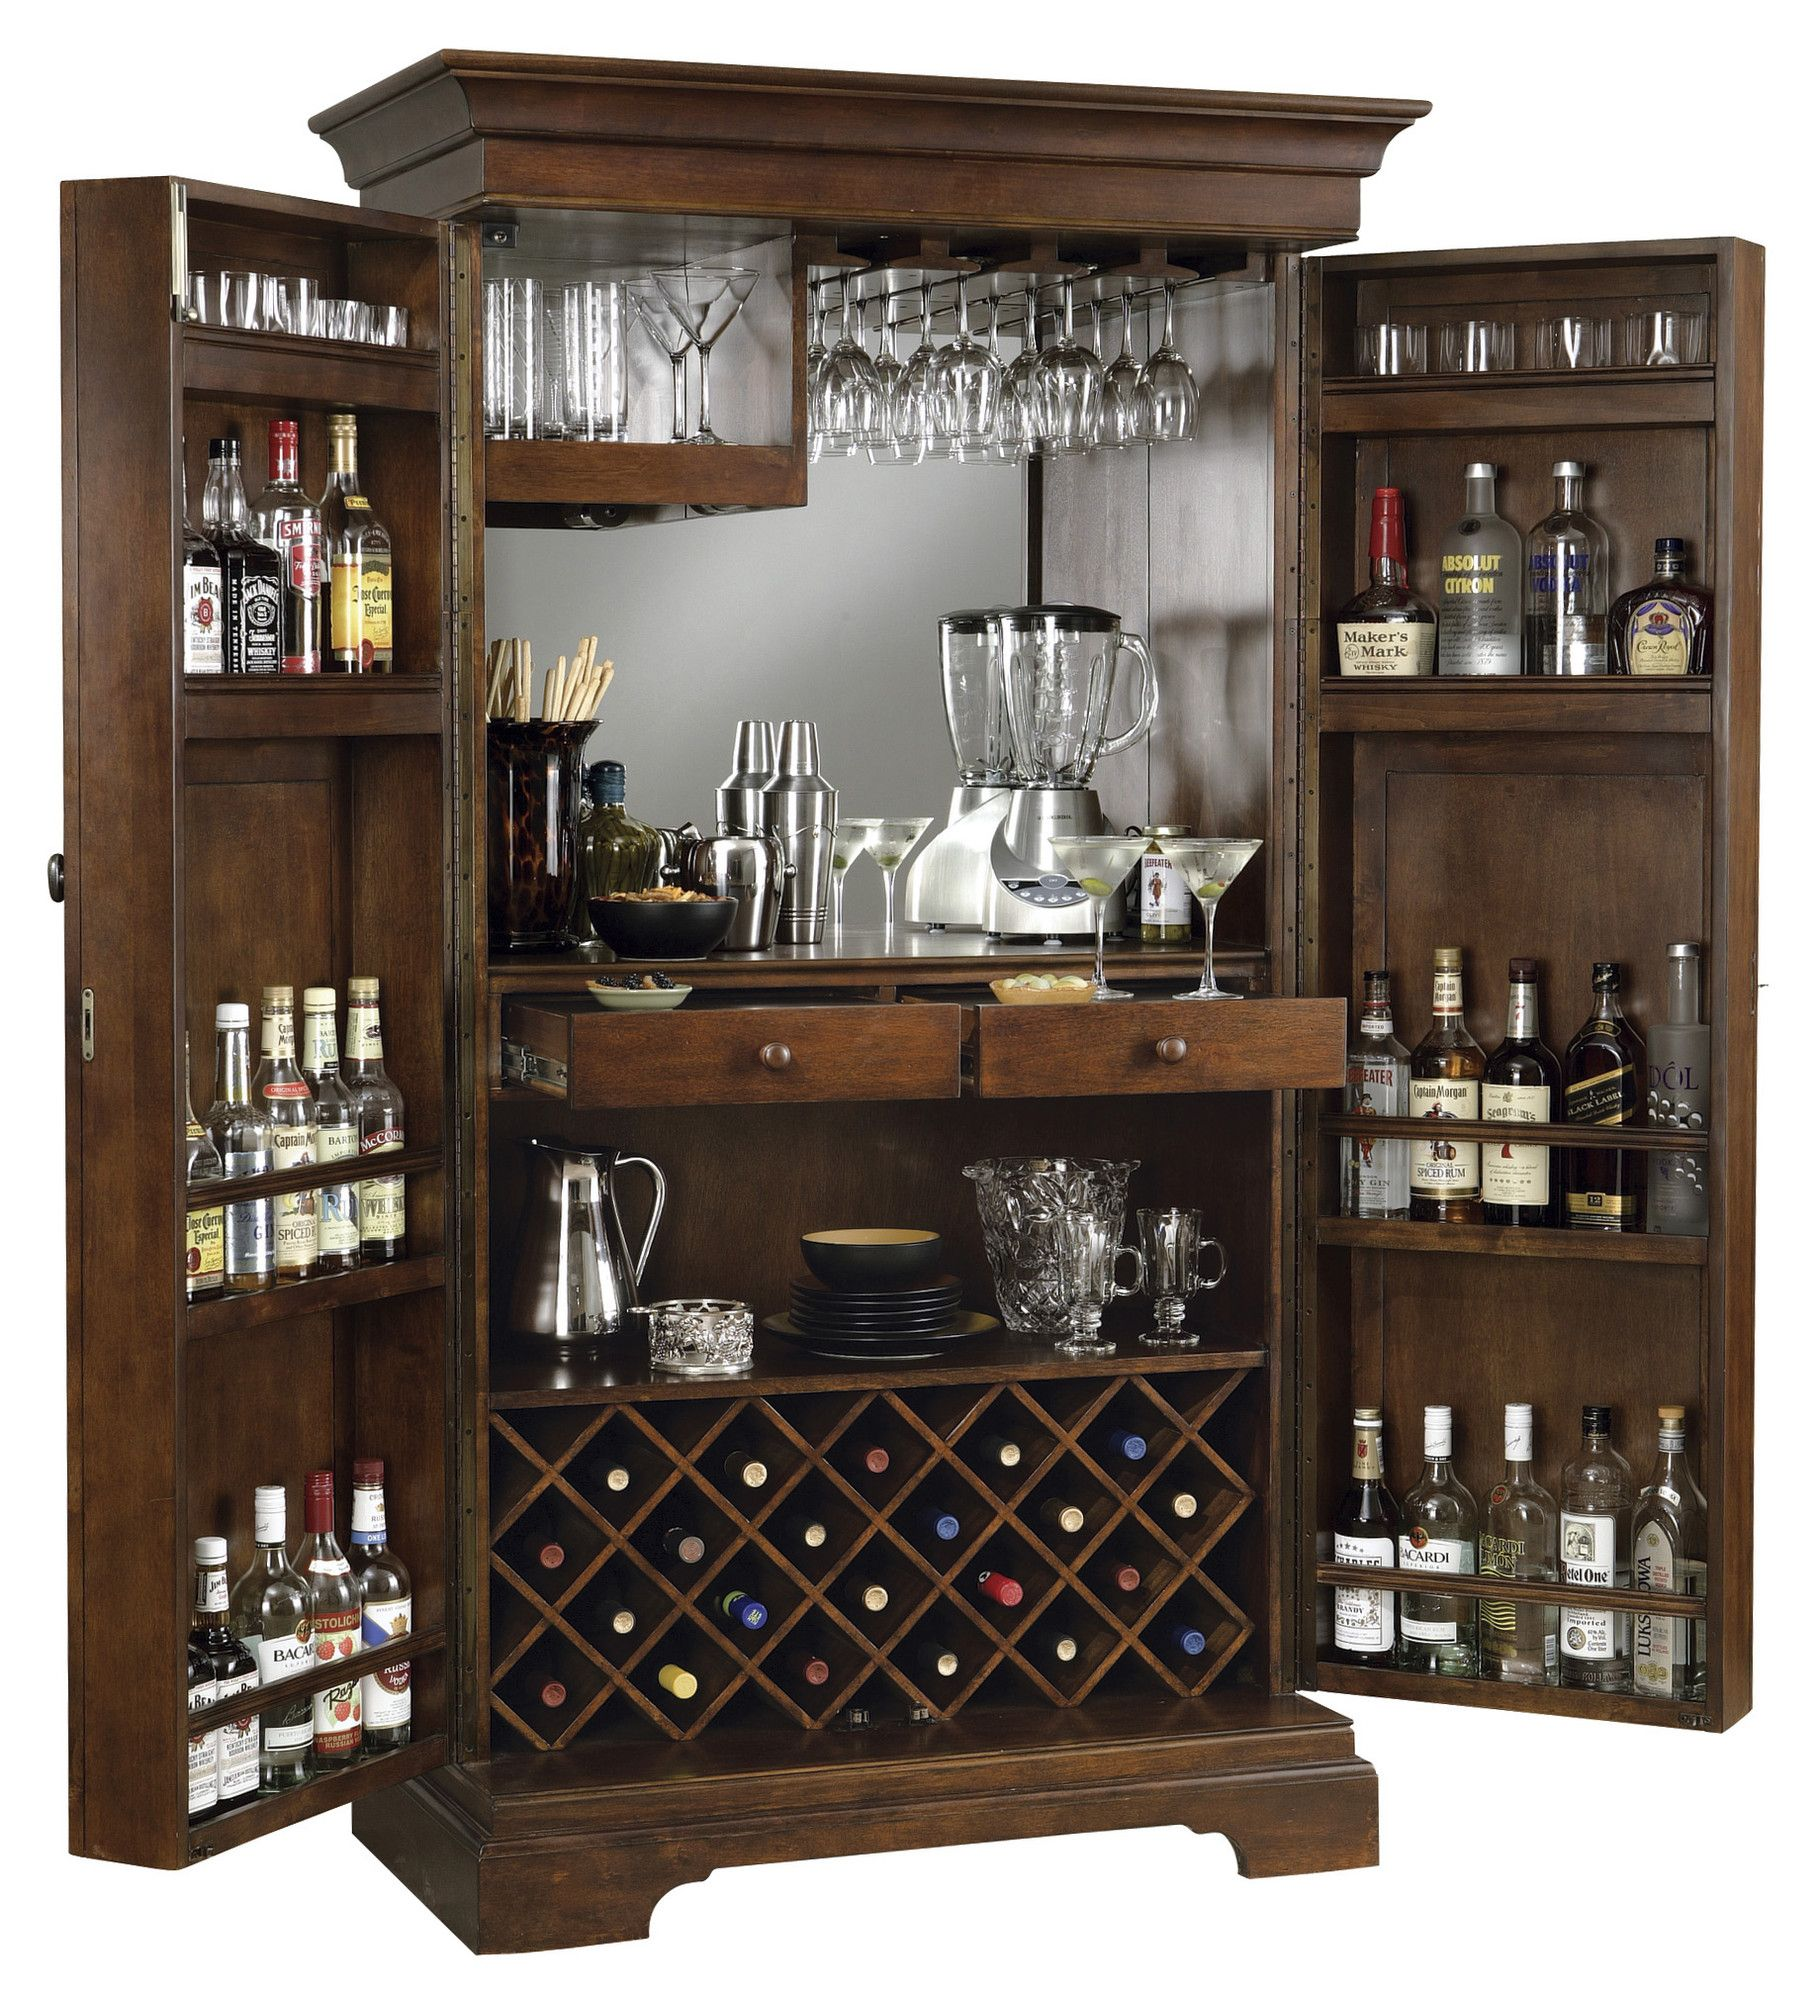 Sonoma Wine Liquor Cabinet Wayfair Australia Project Ideas